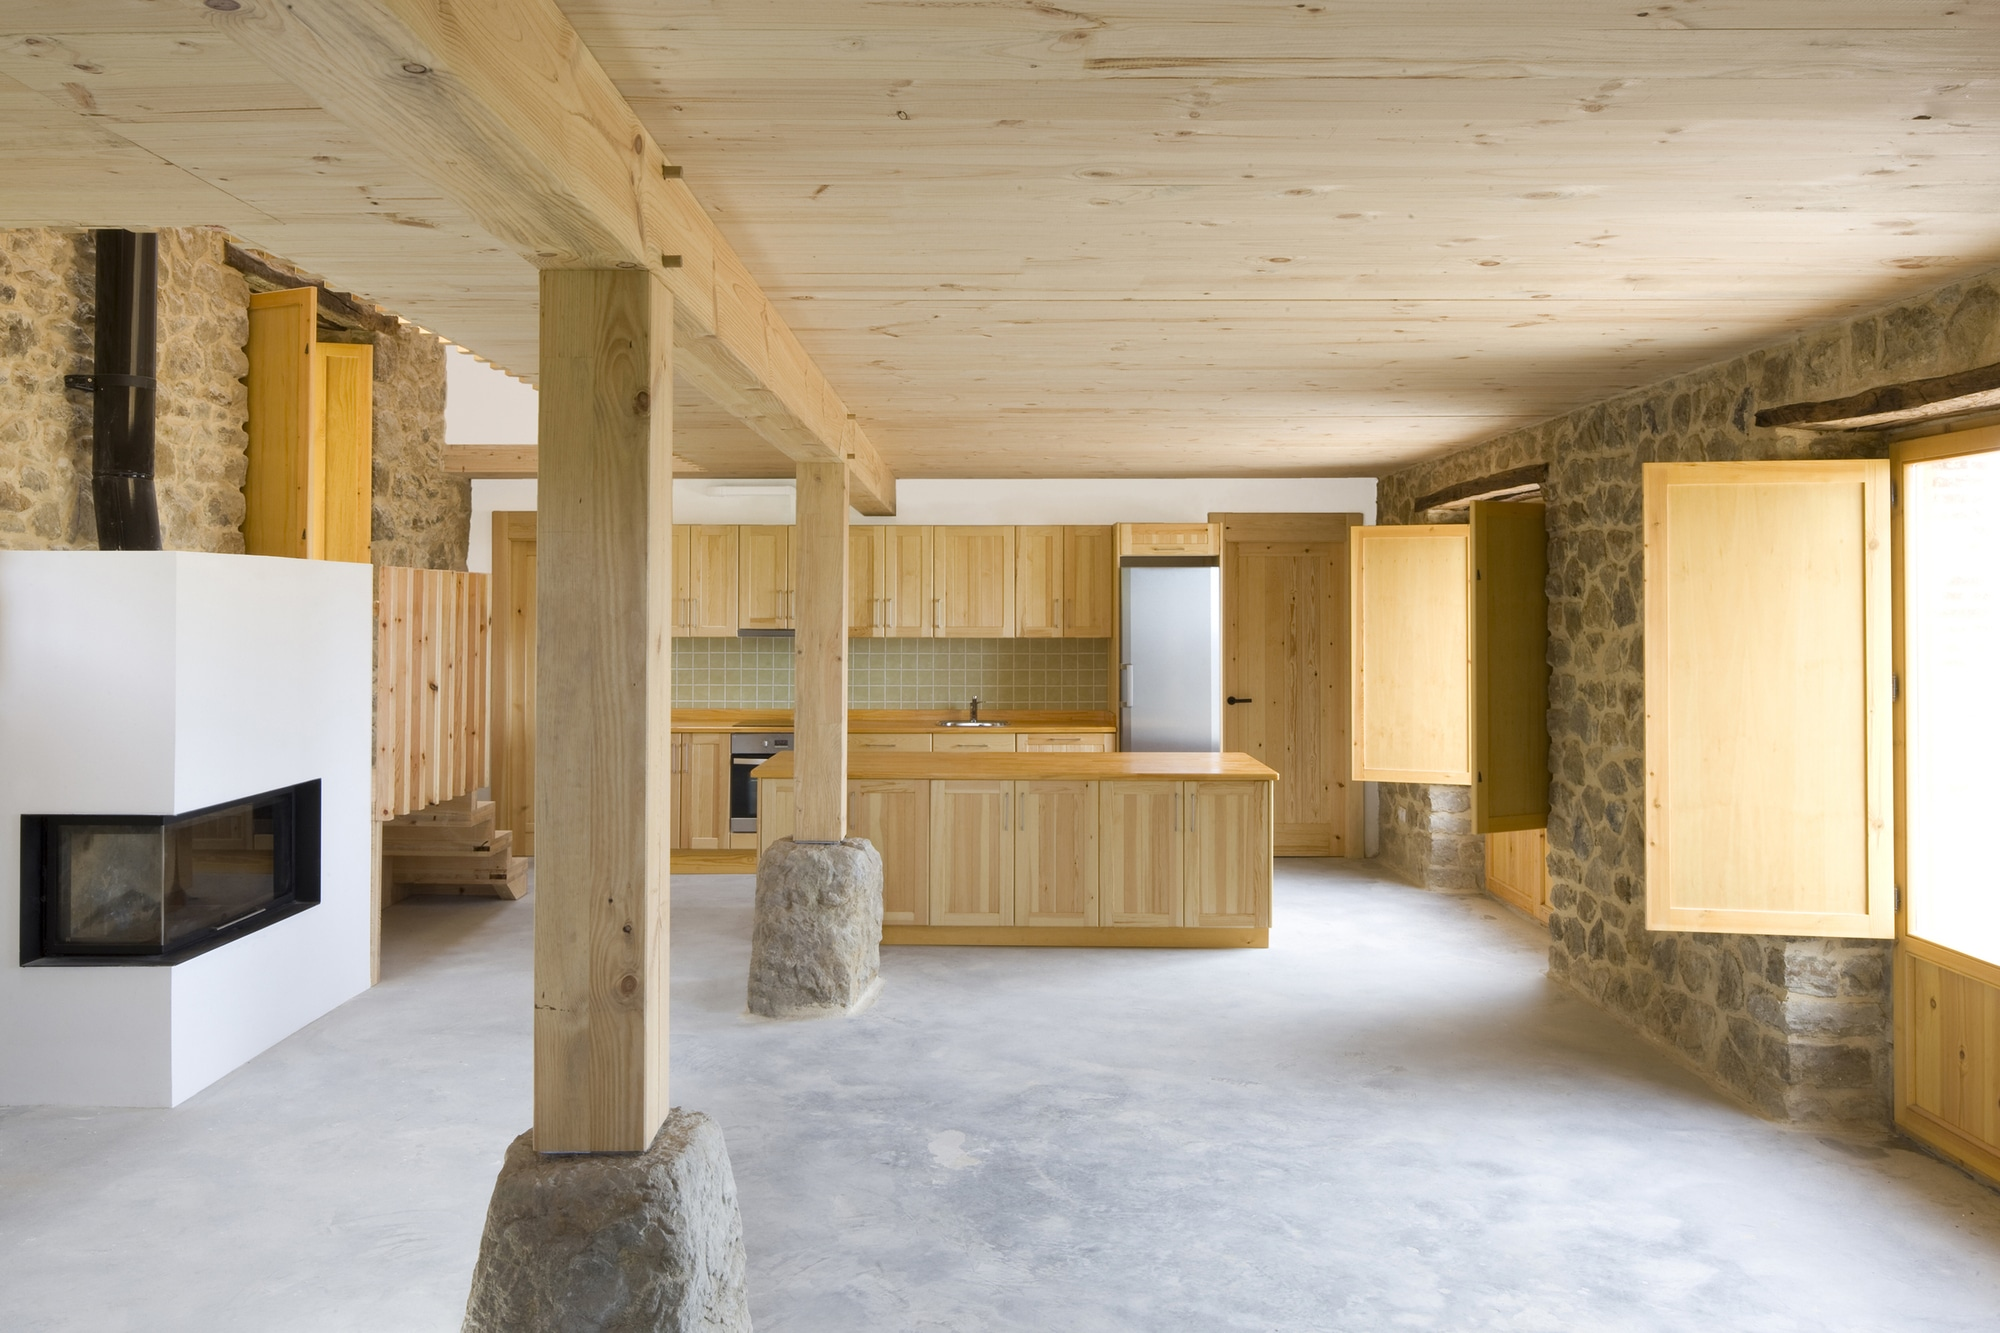 Dise o de casa r stica de piedra planos construye hogar - Interior casas rusticas ...